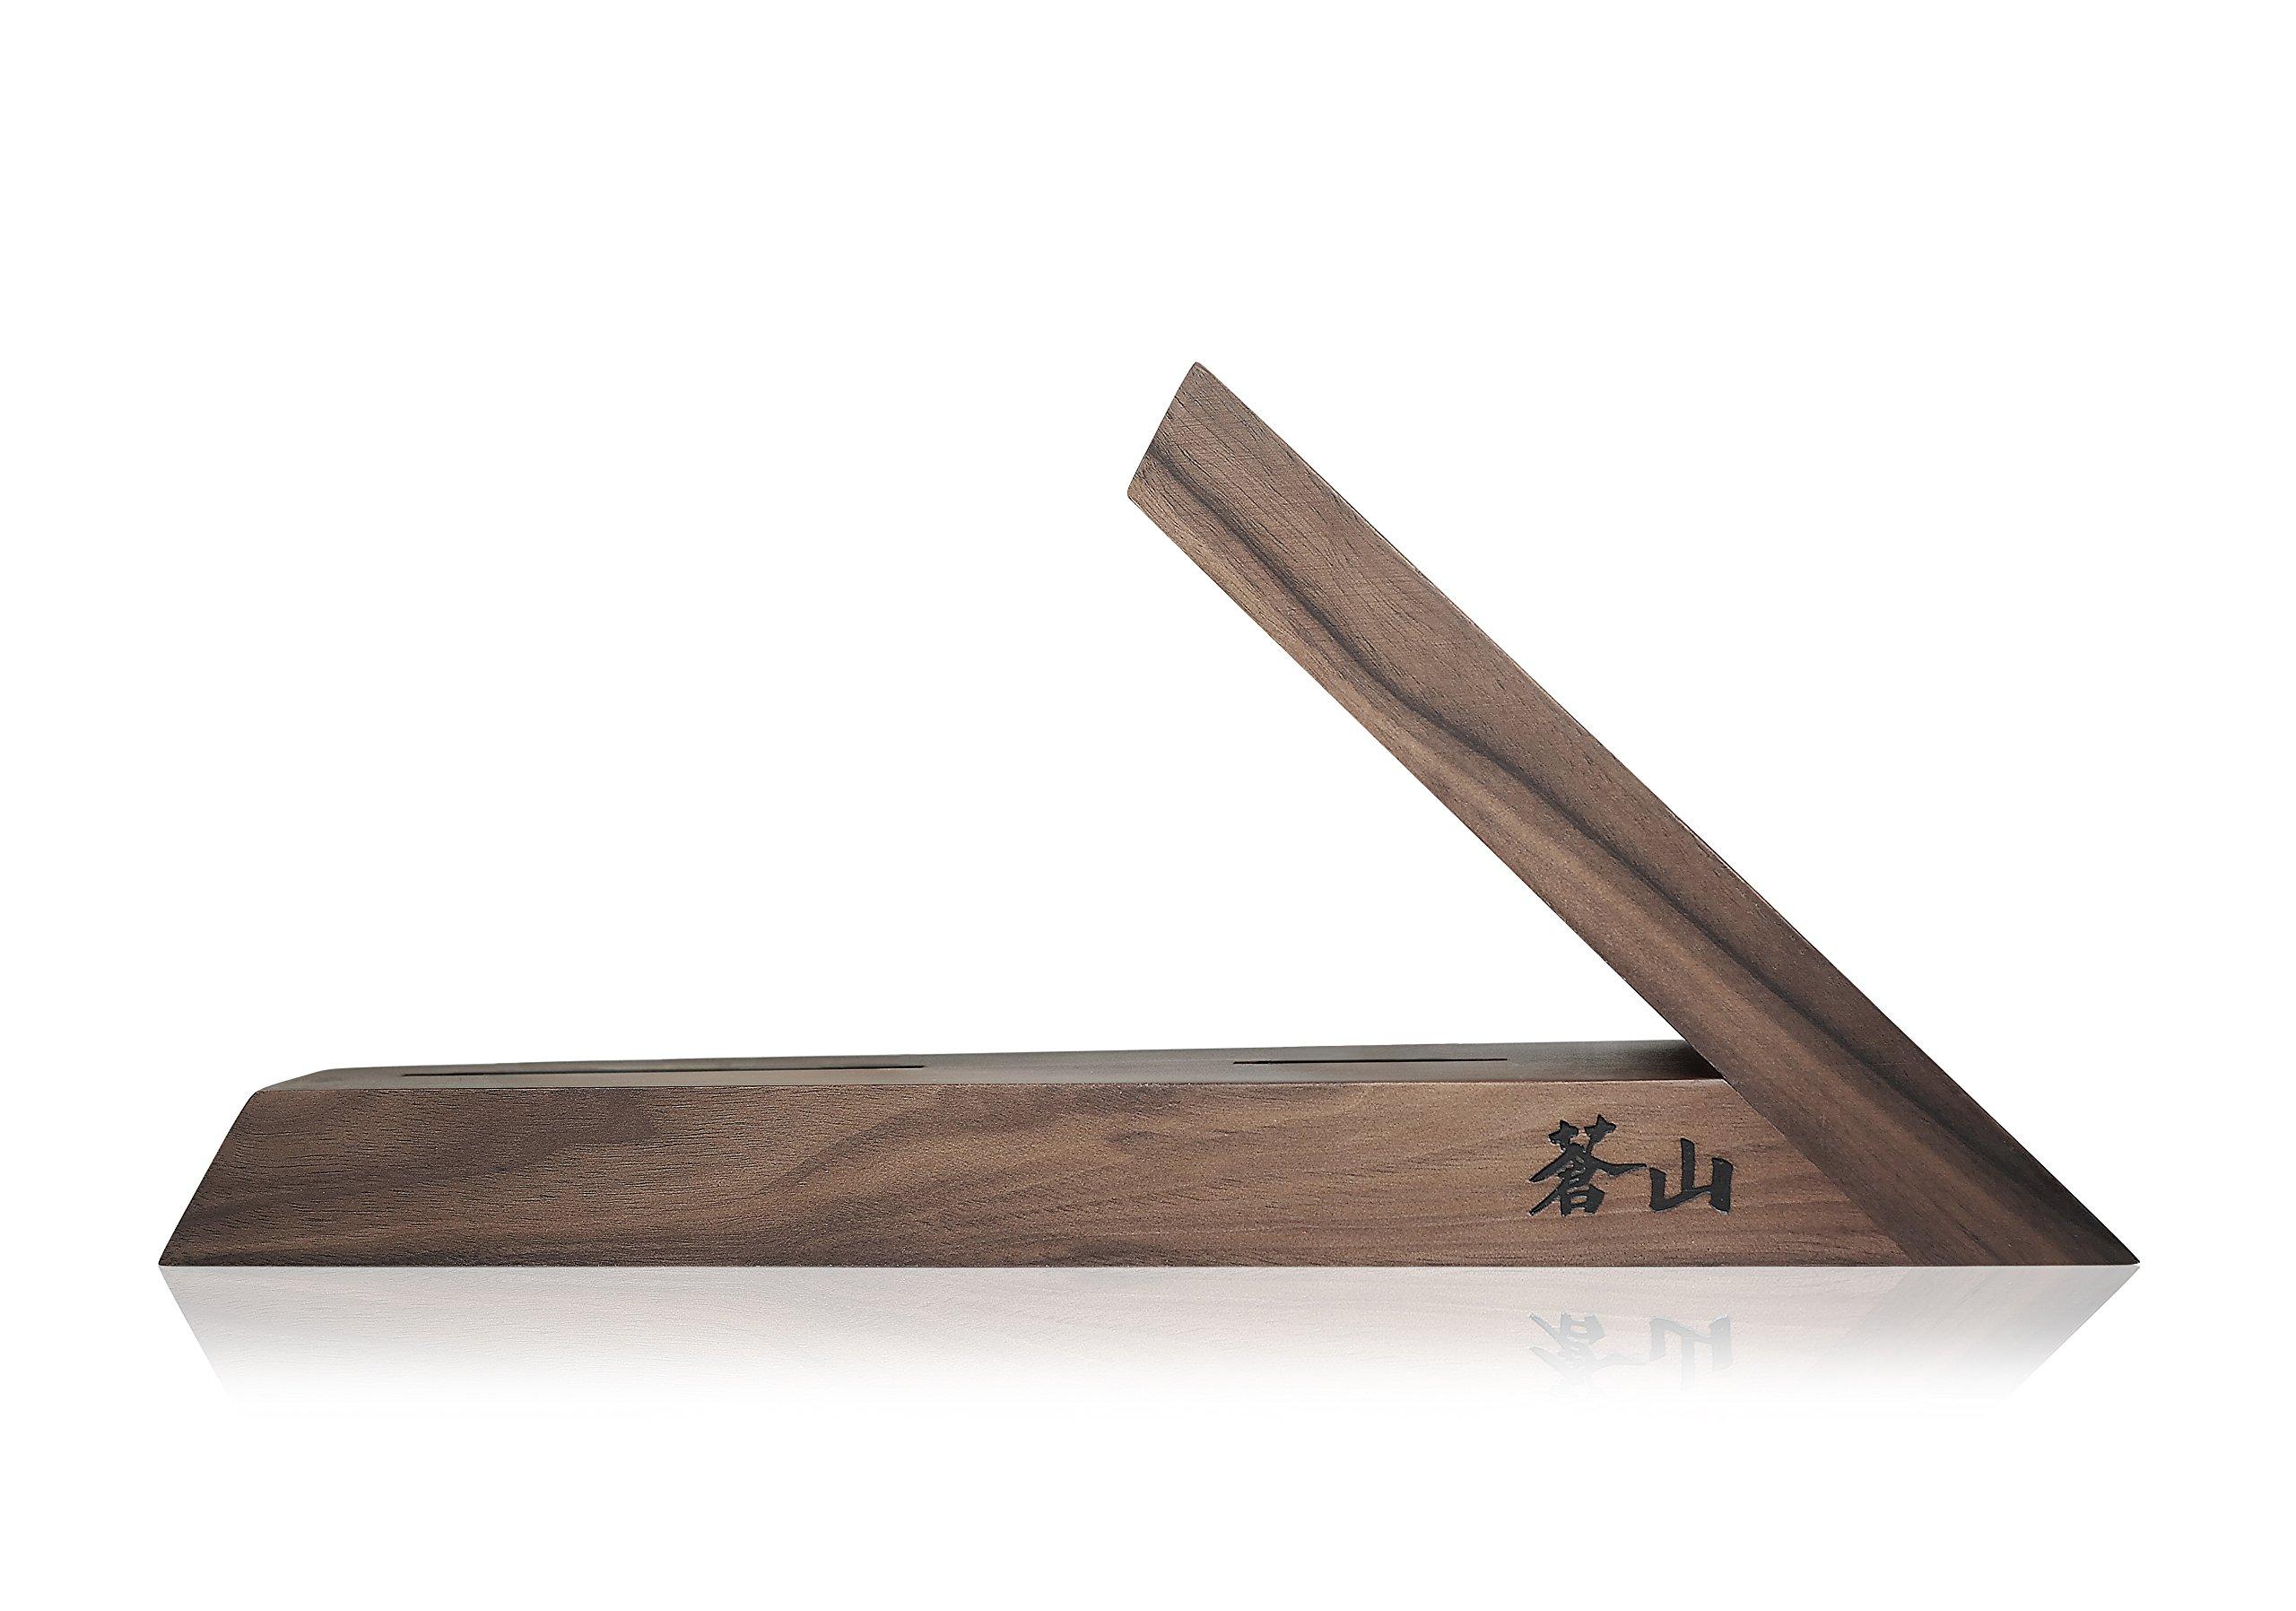 Cangshan 1021240 Triangle Walnut Wood Knife Block, Two Slots